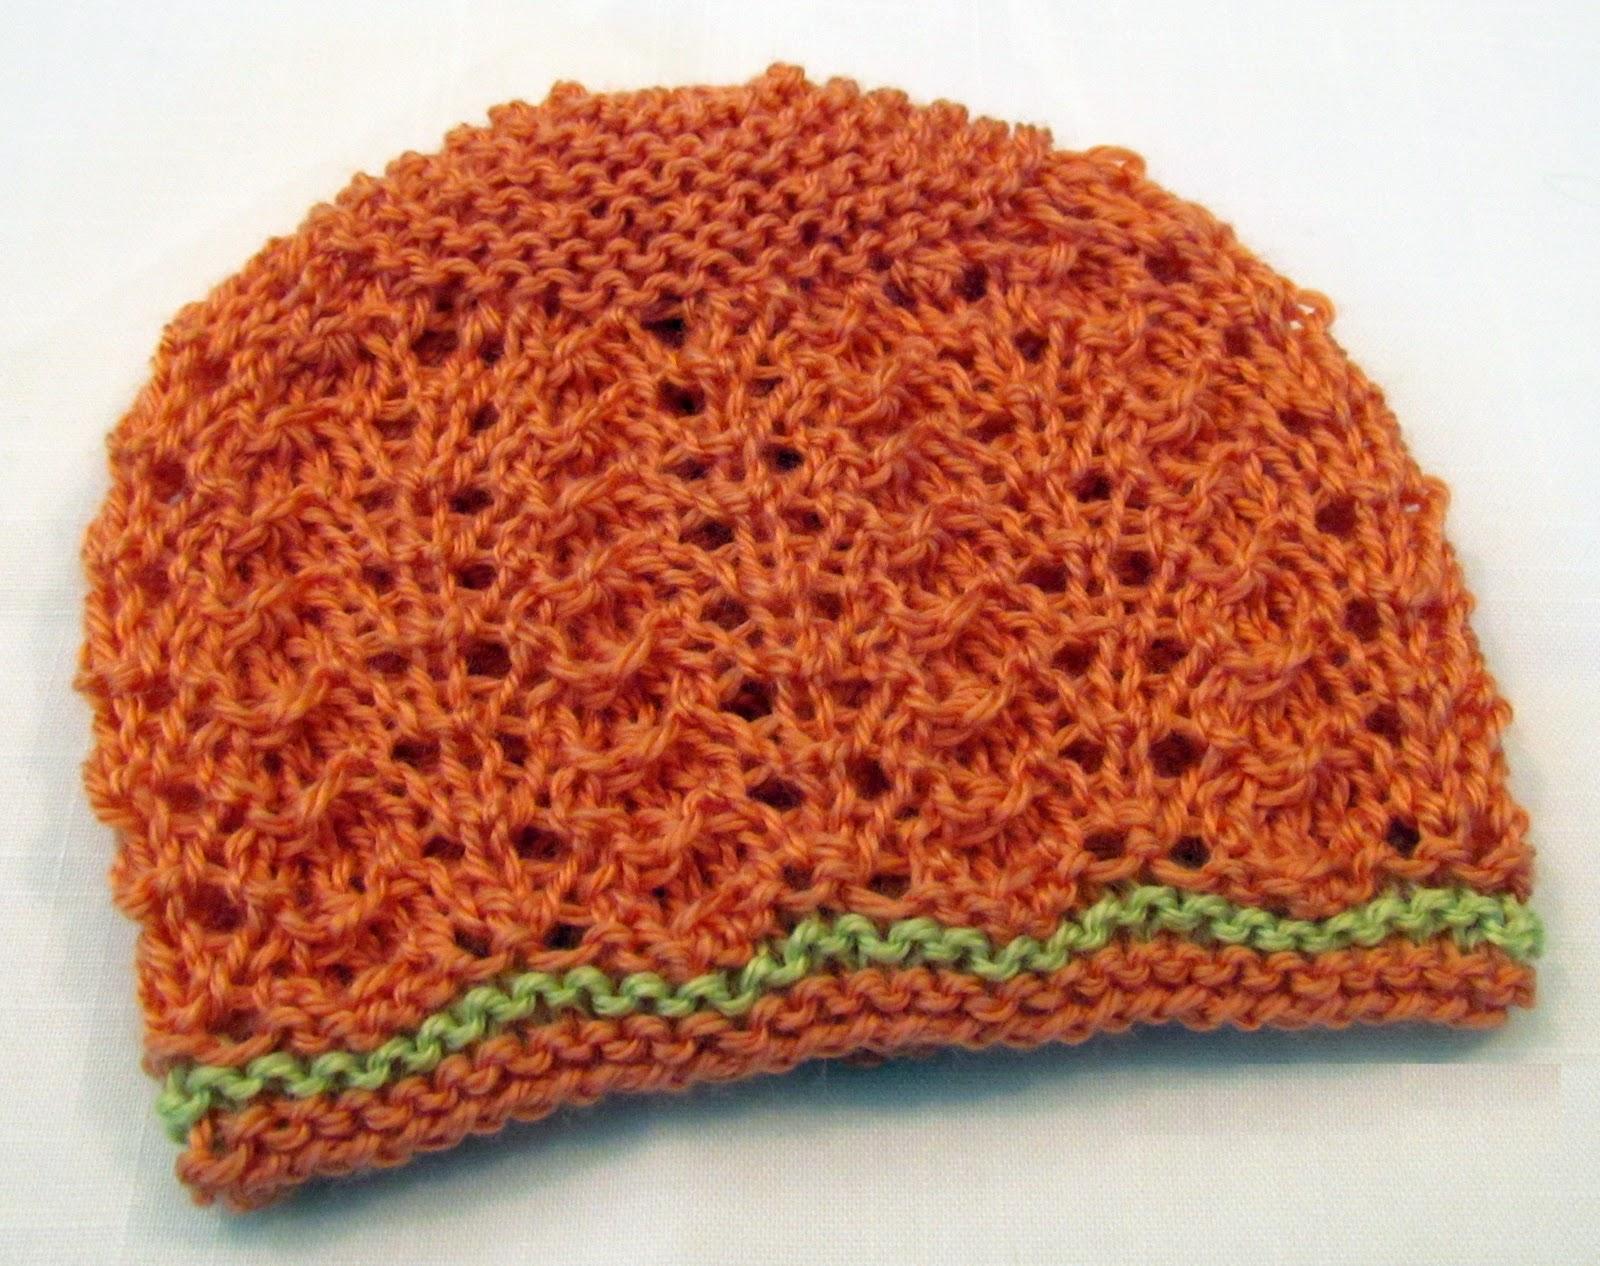 http://3.bp.blogspot.com/_i-FANGtrZCk/TUCyB_UrV9I/AAAAAAAAAQQ/OTgmVLUIFo0/s1600/baby+hat.jpg